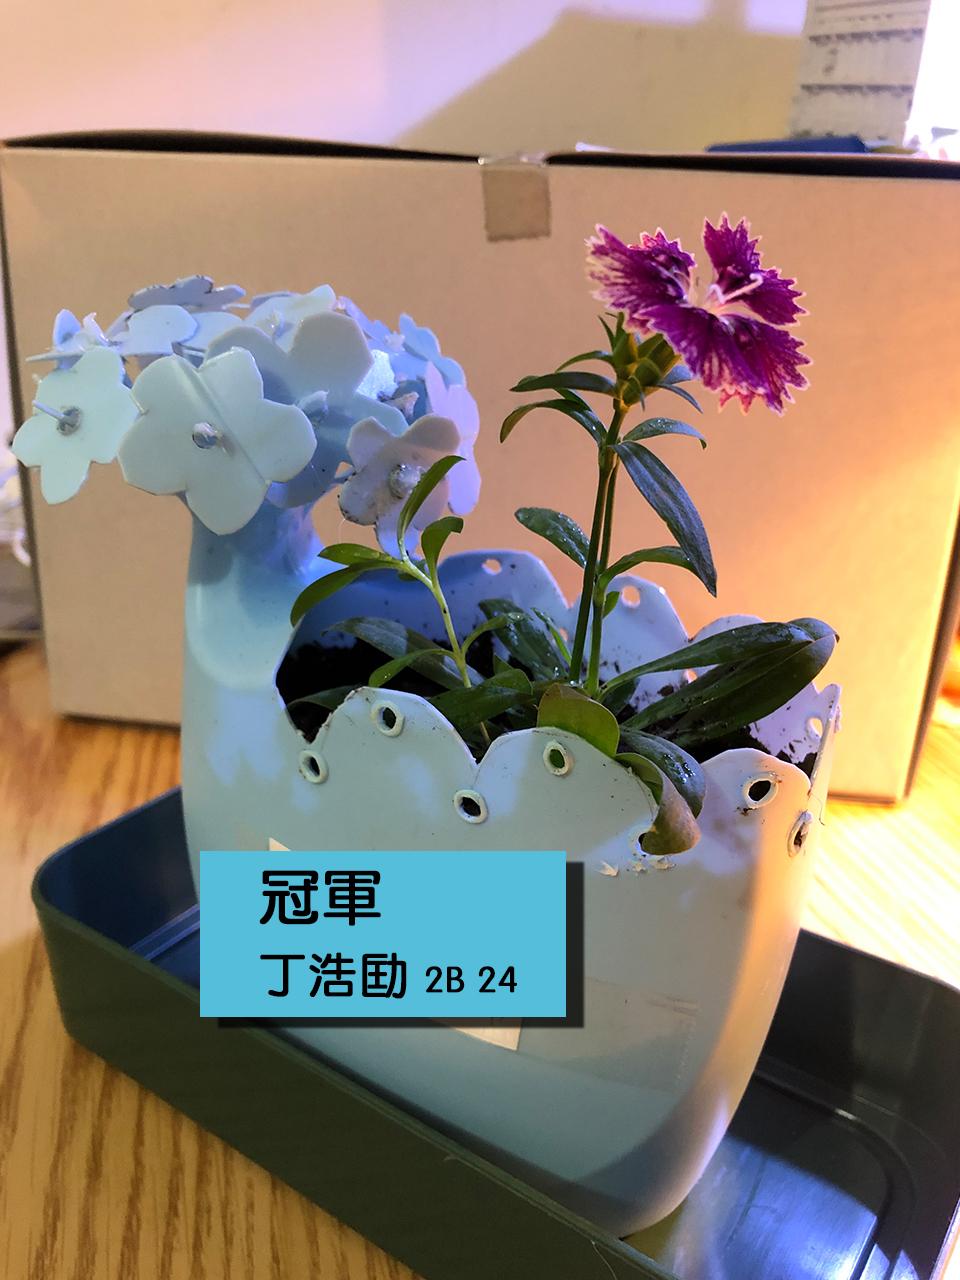 https://plkcjy.edu.hk/sites/default/files/_guan_jun_2b_24_ding_hao_kuang_.jpg